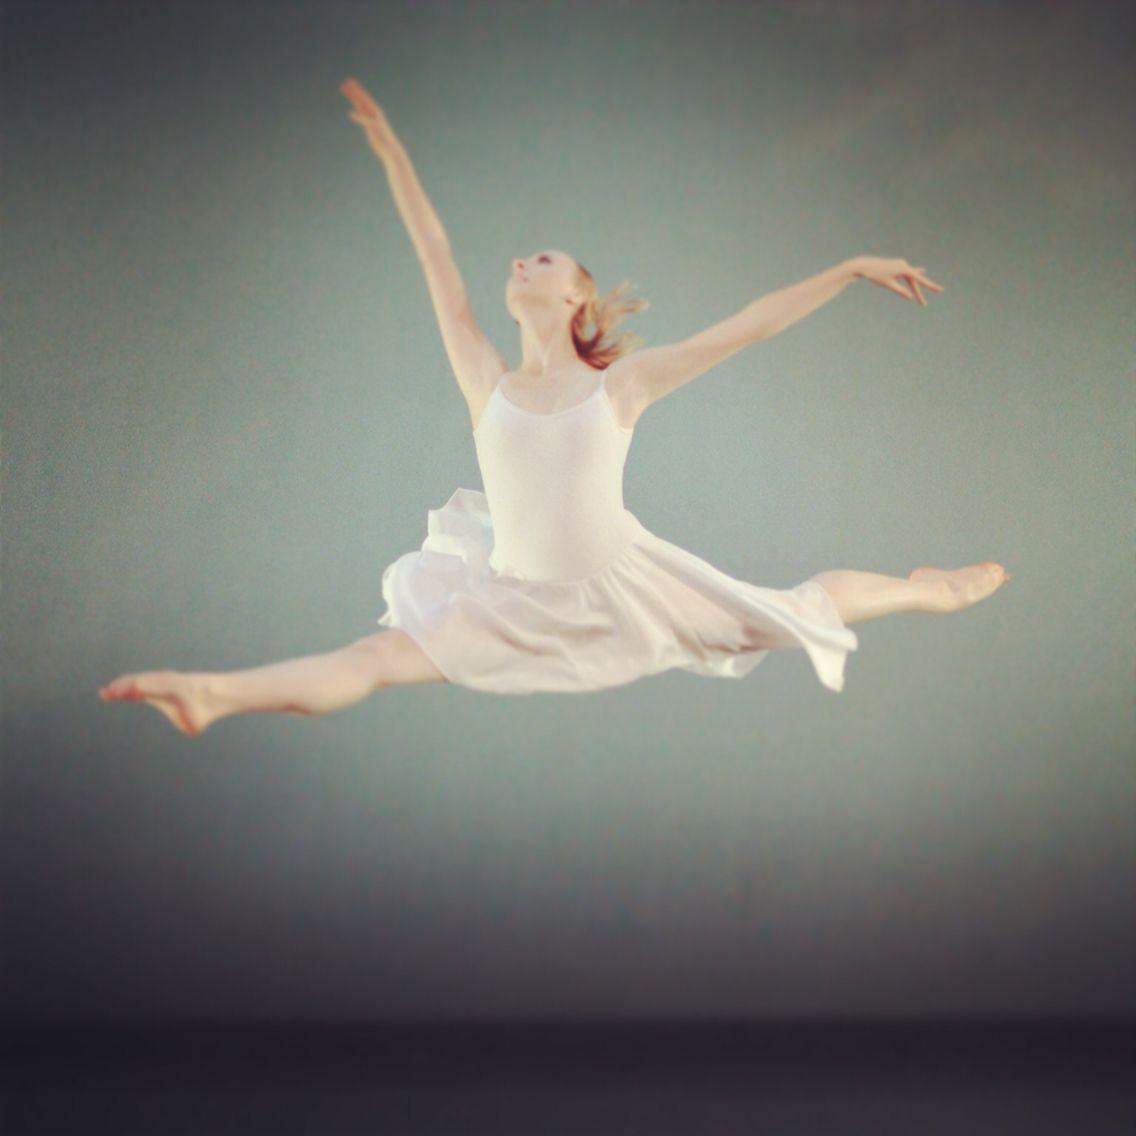 http://www.gregoryhancockdancetheatre.org